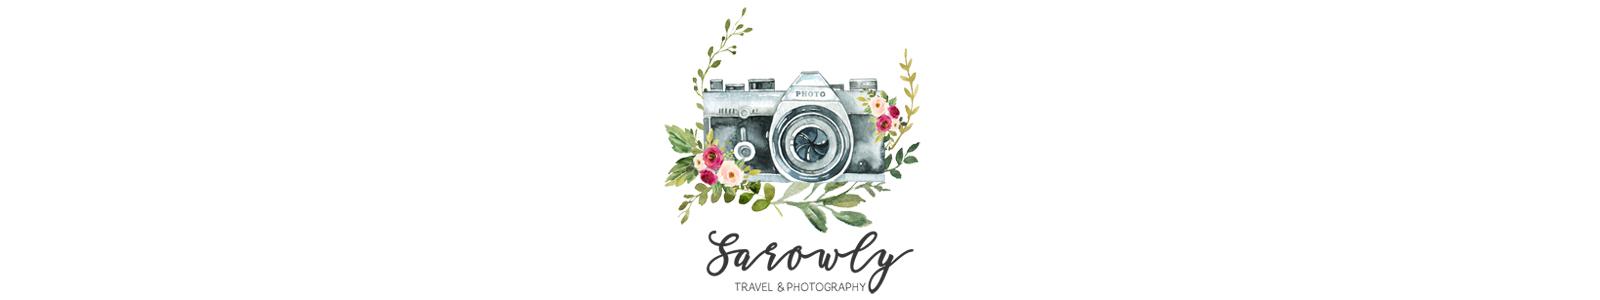 SAROWLY | blog o podróżach i fotografii